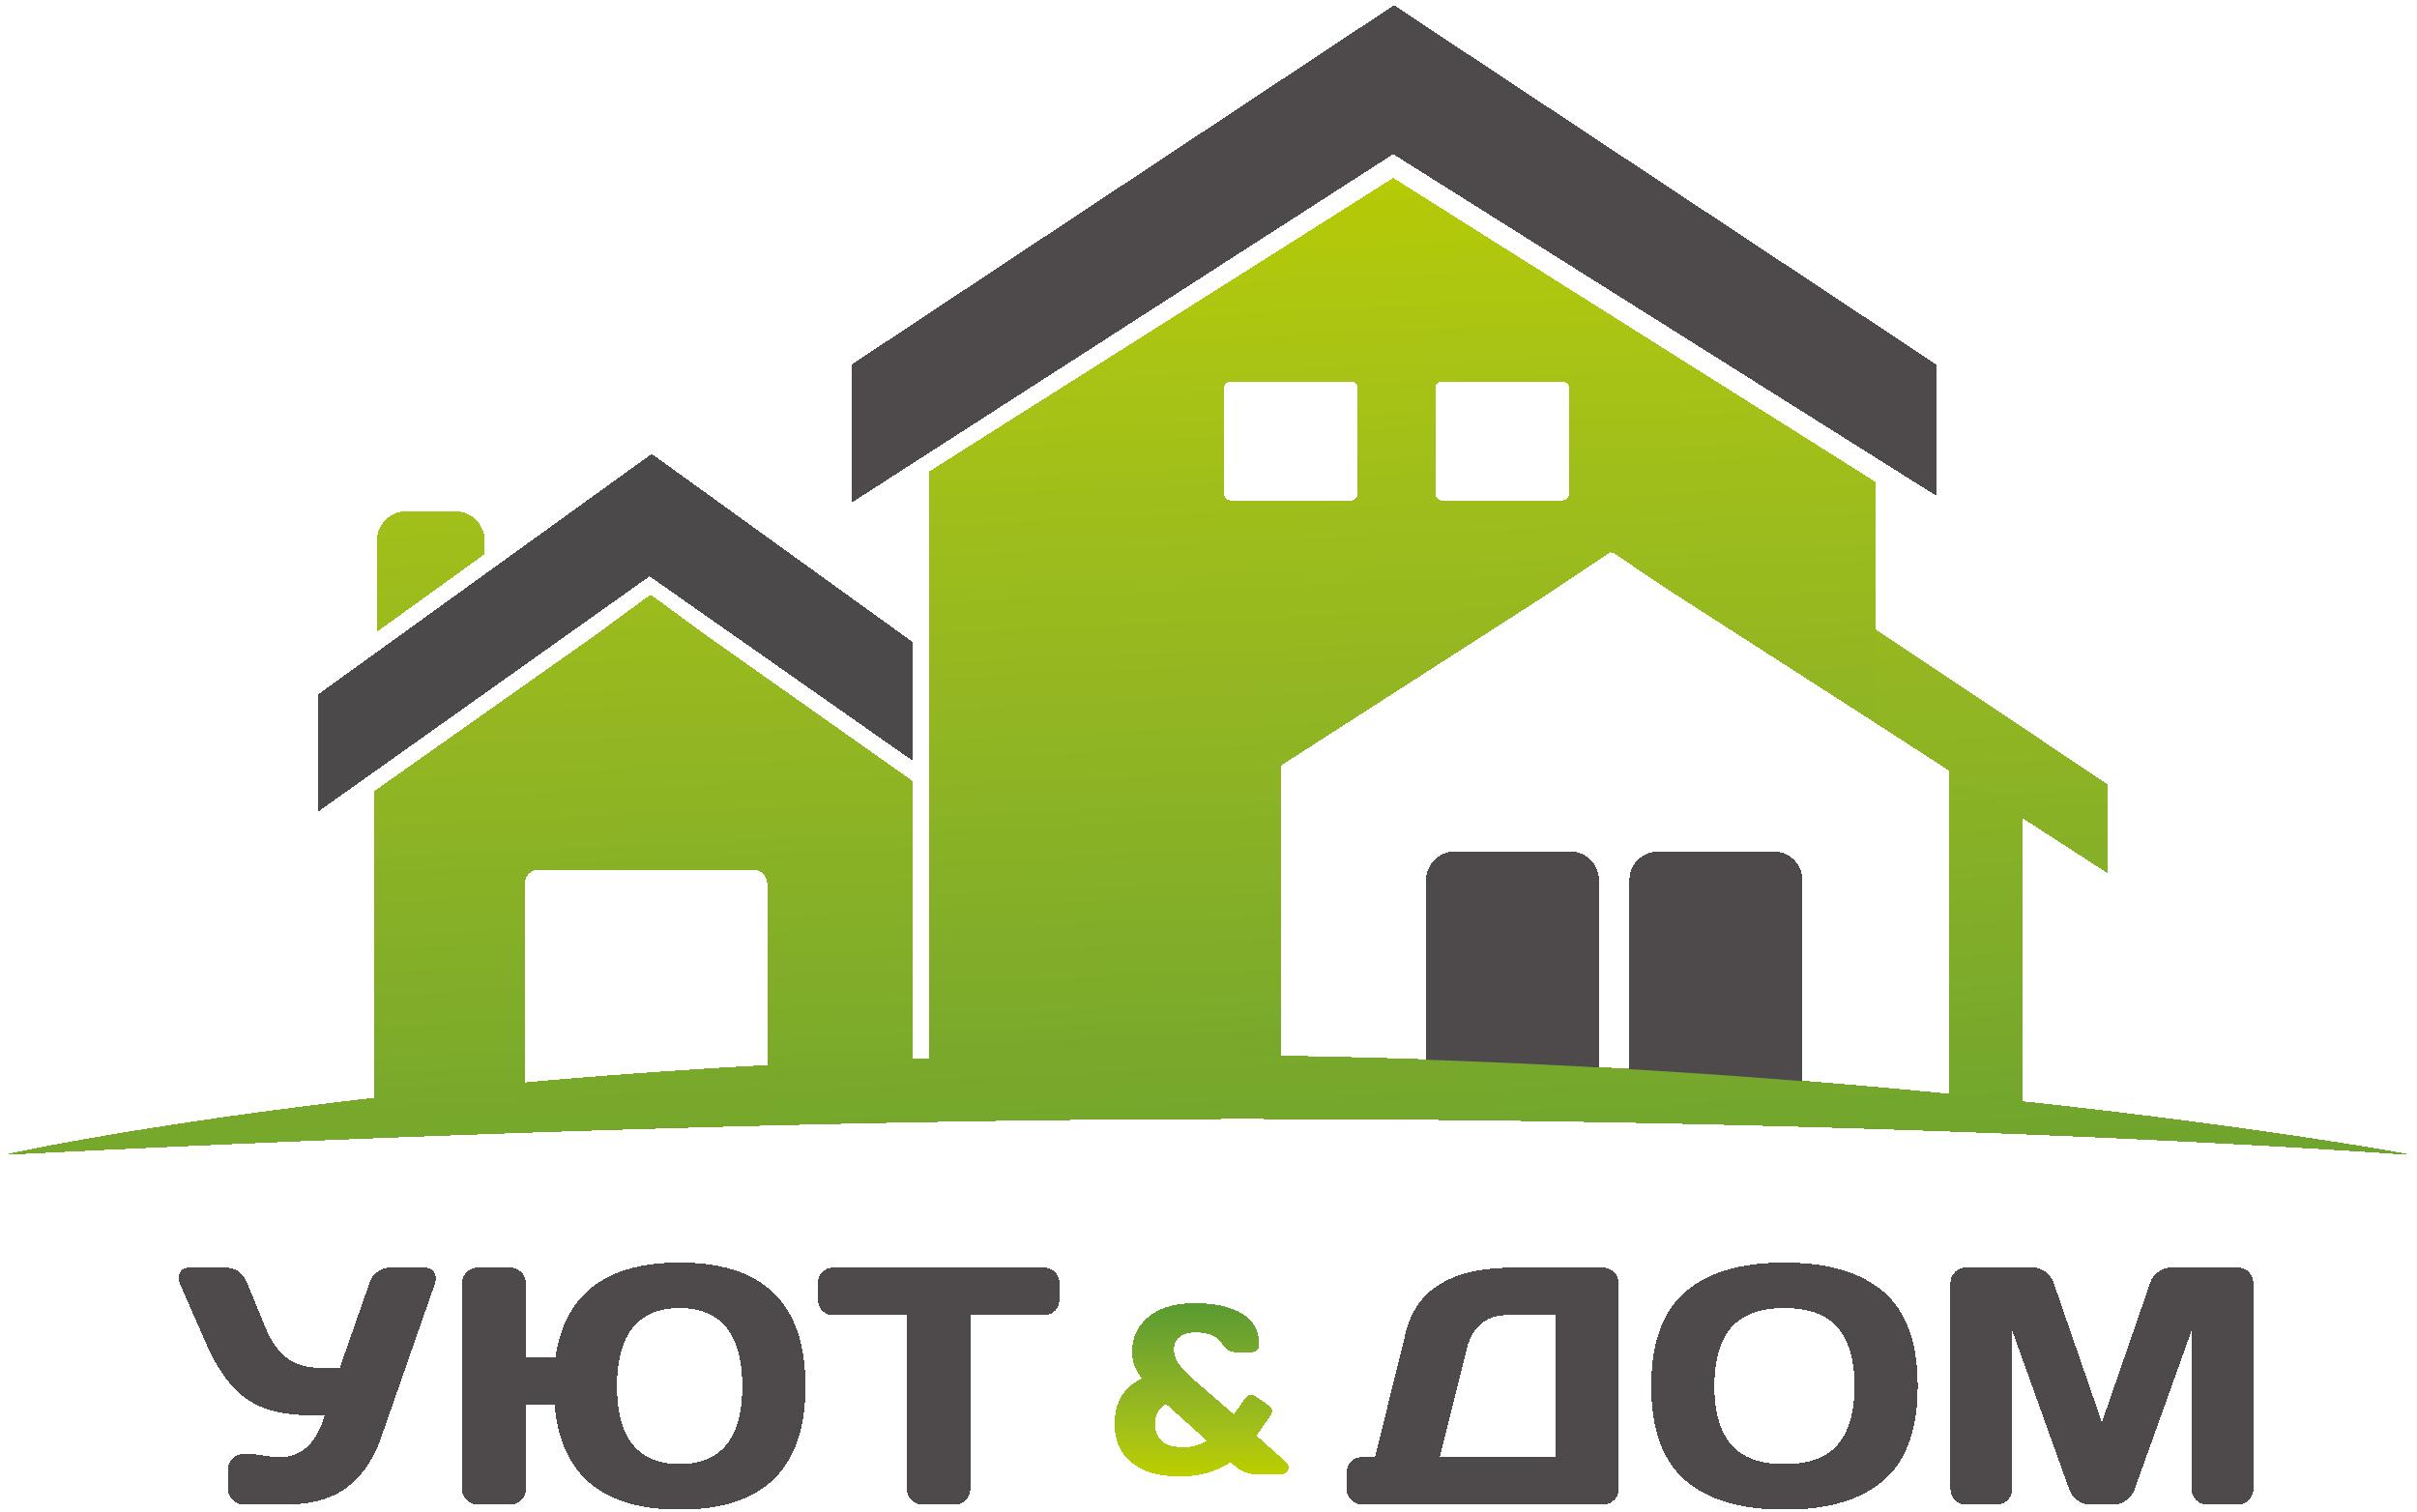 logotip-zeleny.png